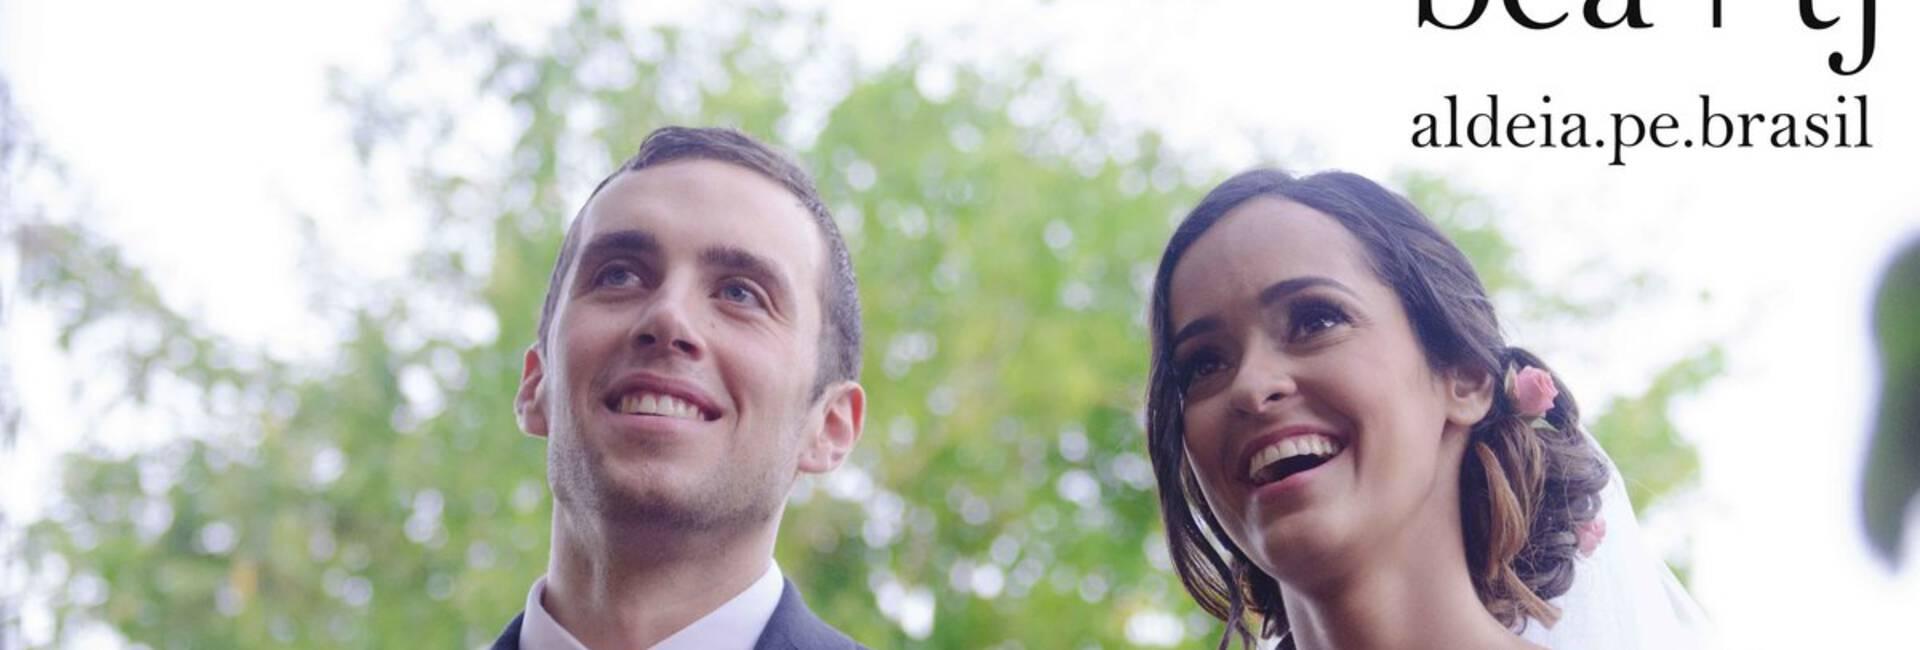 Casamento de TJ & Bea